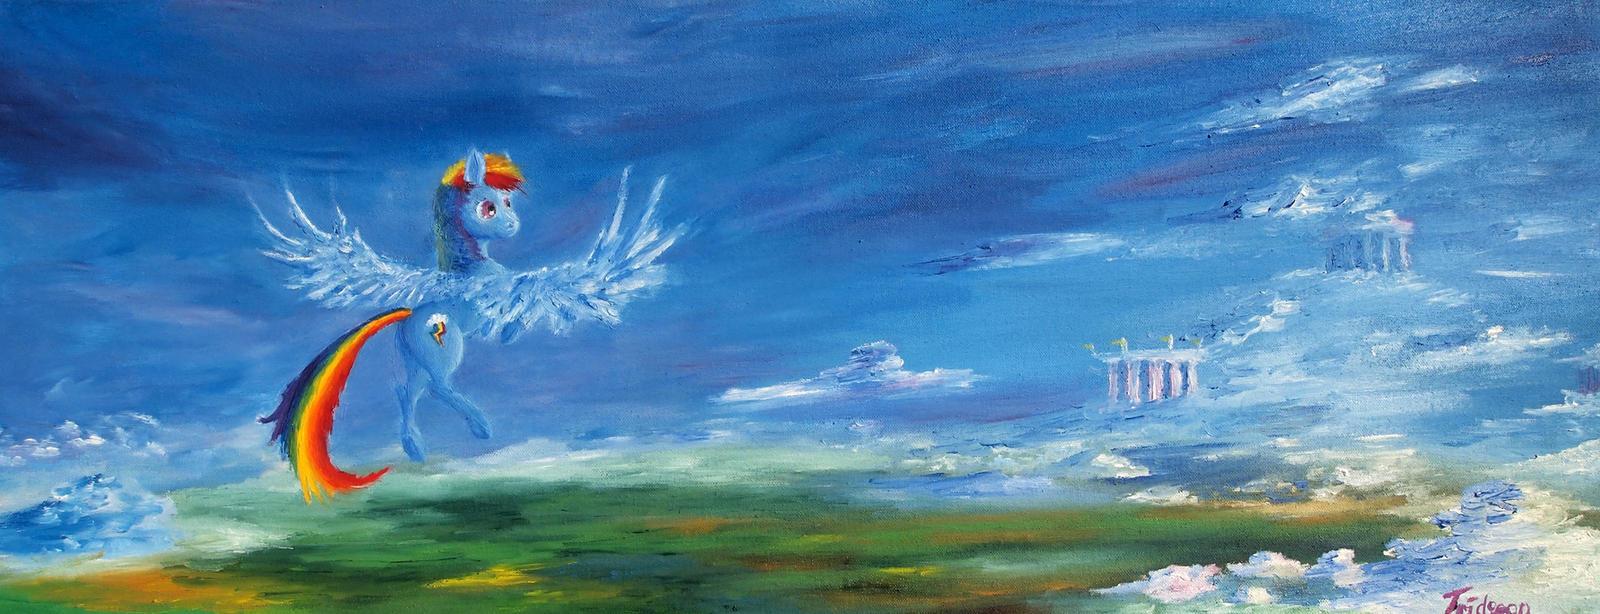 Dashing through Cloudsdale by Tridgeon